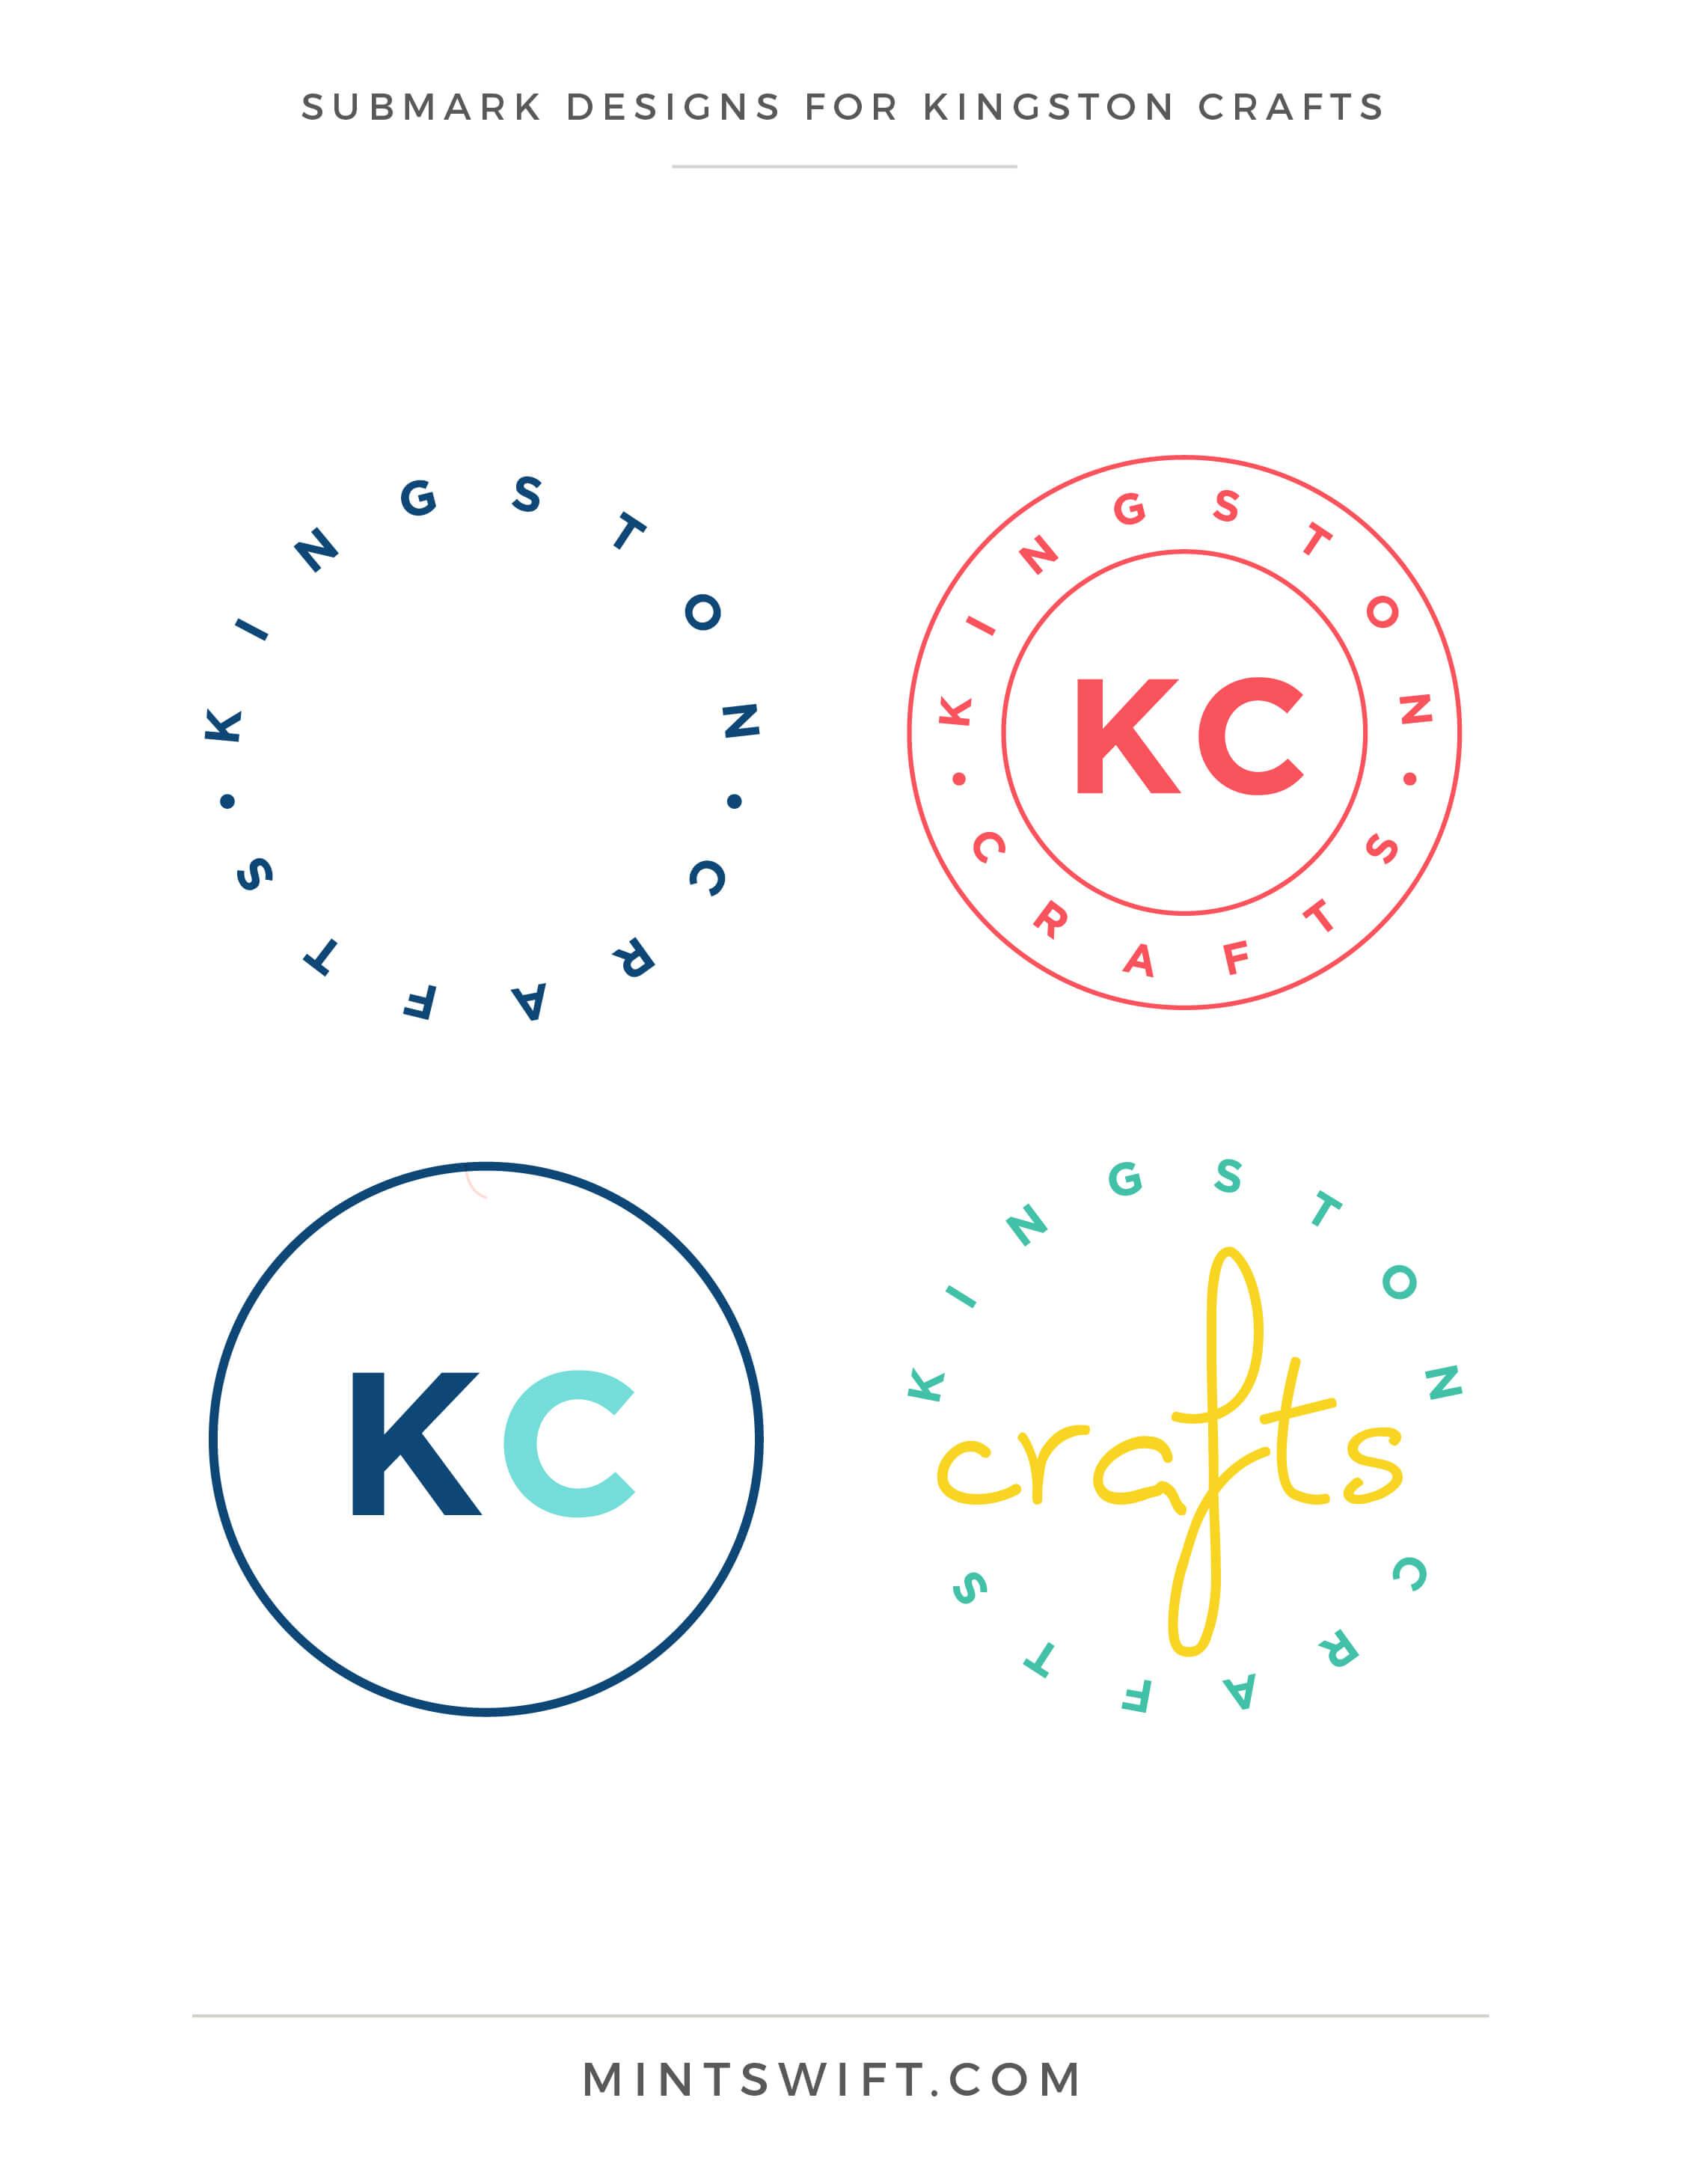 Kingston Crafts - Submark Designs - Brand Design Package - MintSwift